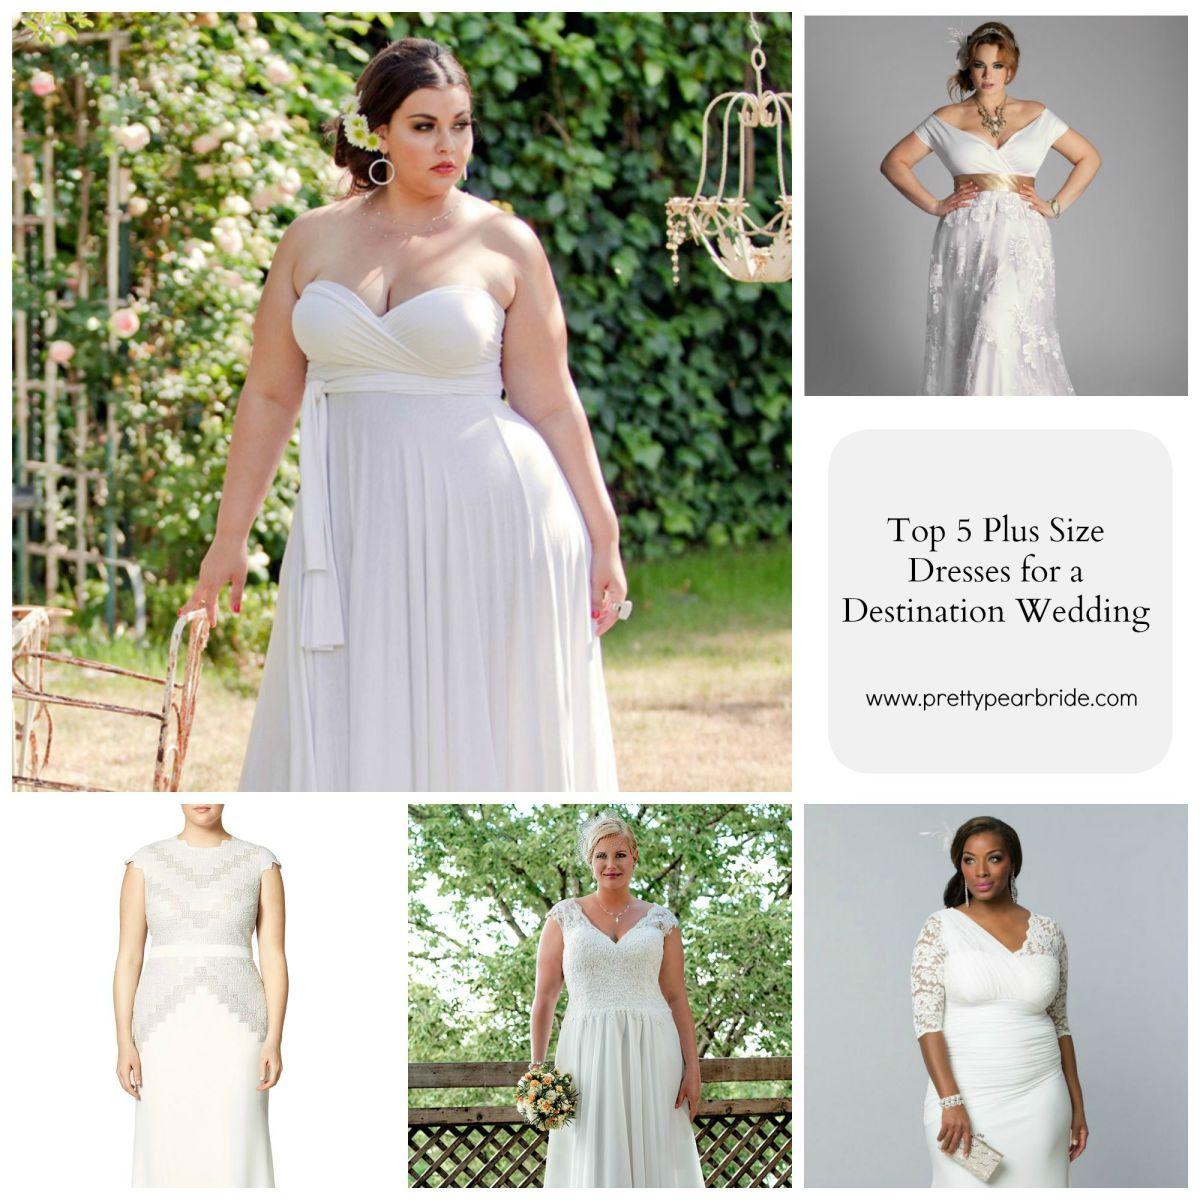 Top 5 Plus Size Wedding Dresses For A Destination Wedding